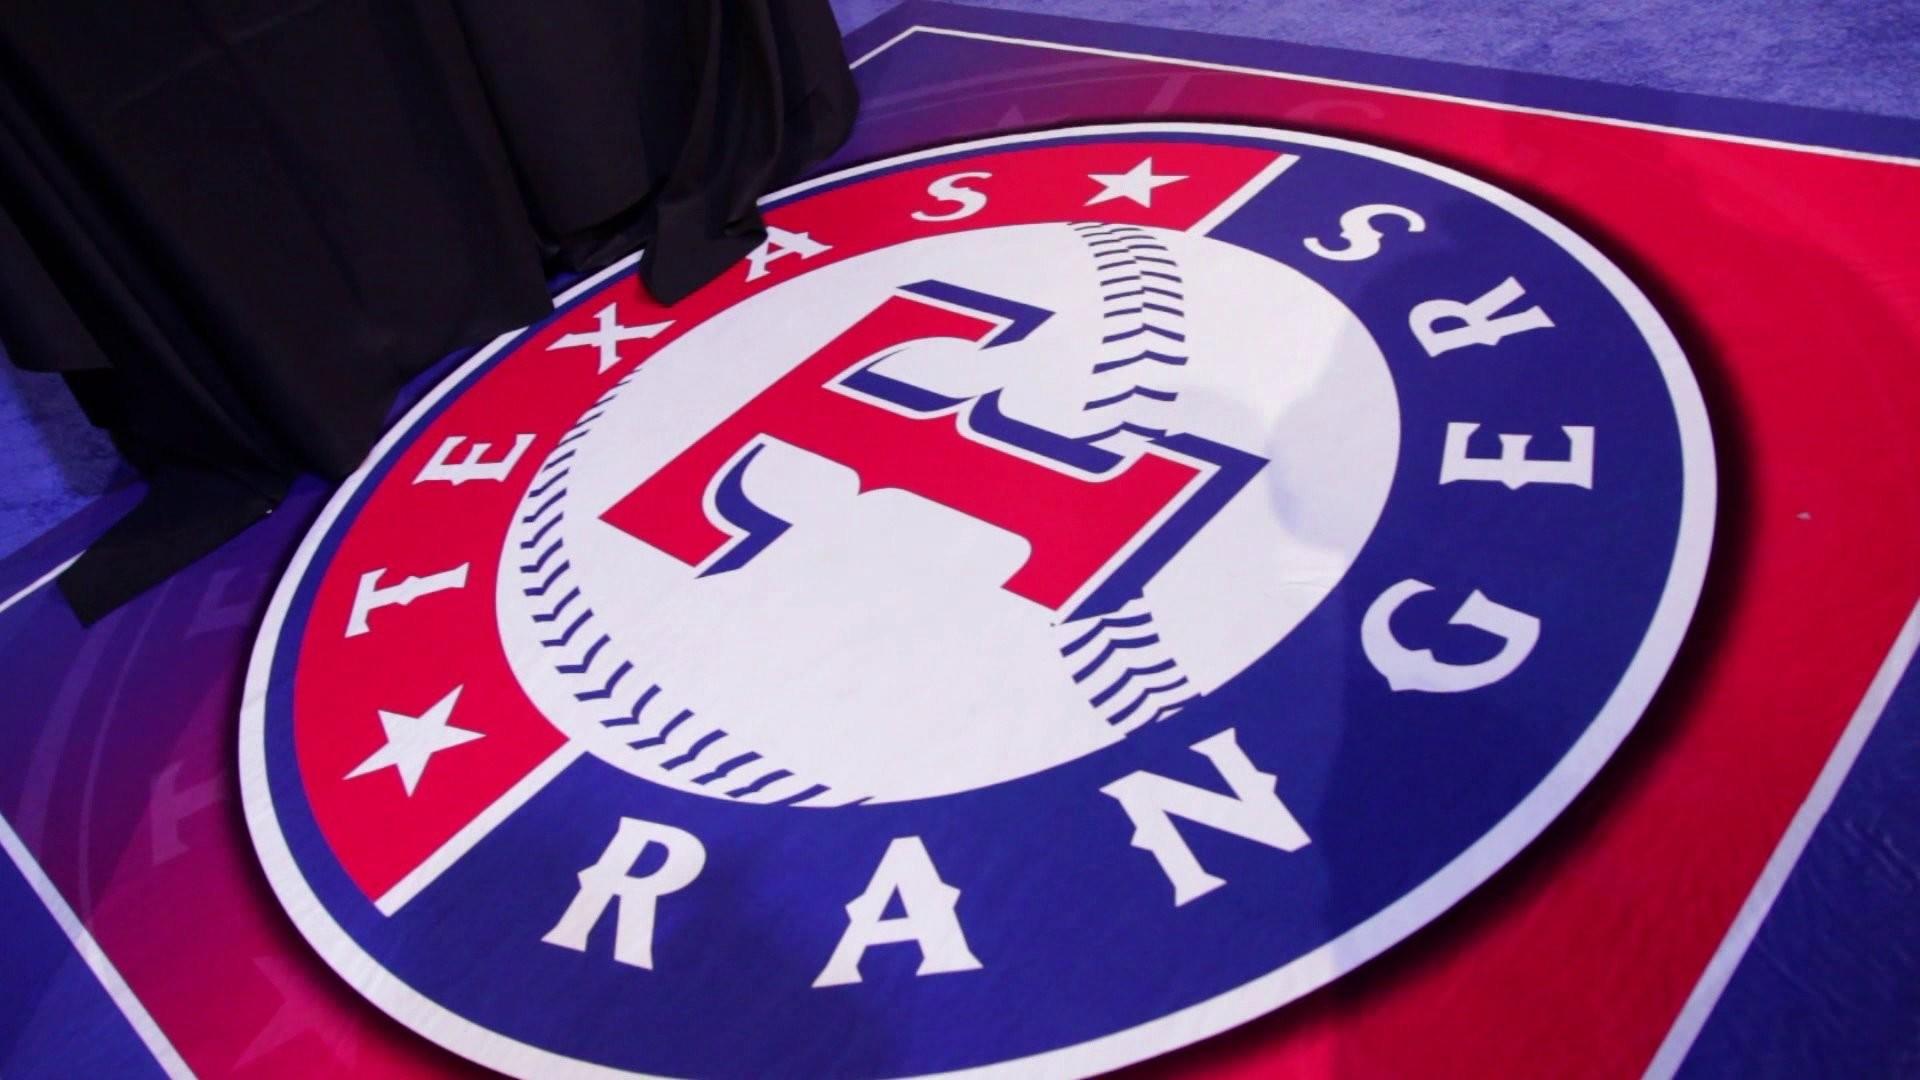 TEXAS RANGERS baseball mlb (61) wallpaper | | 319035 .